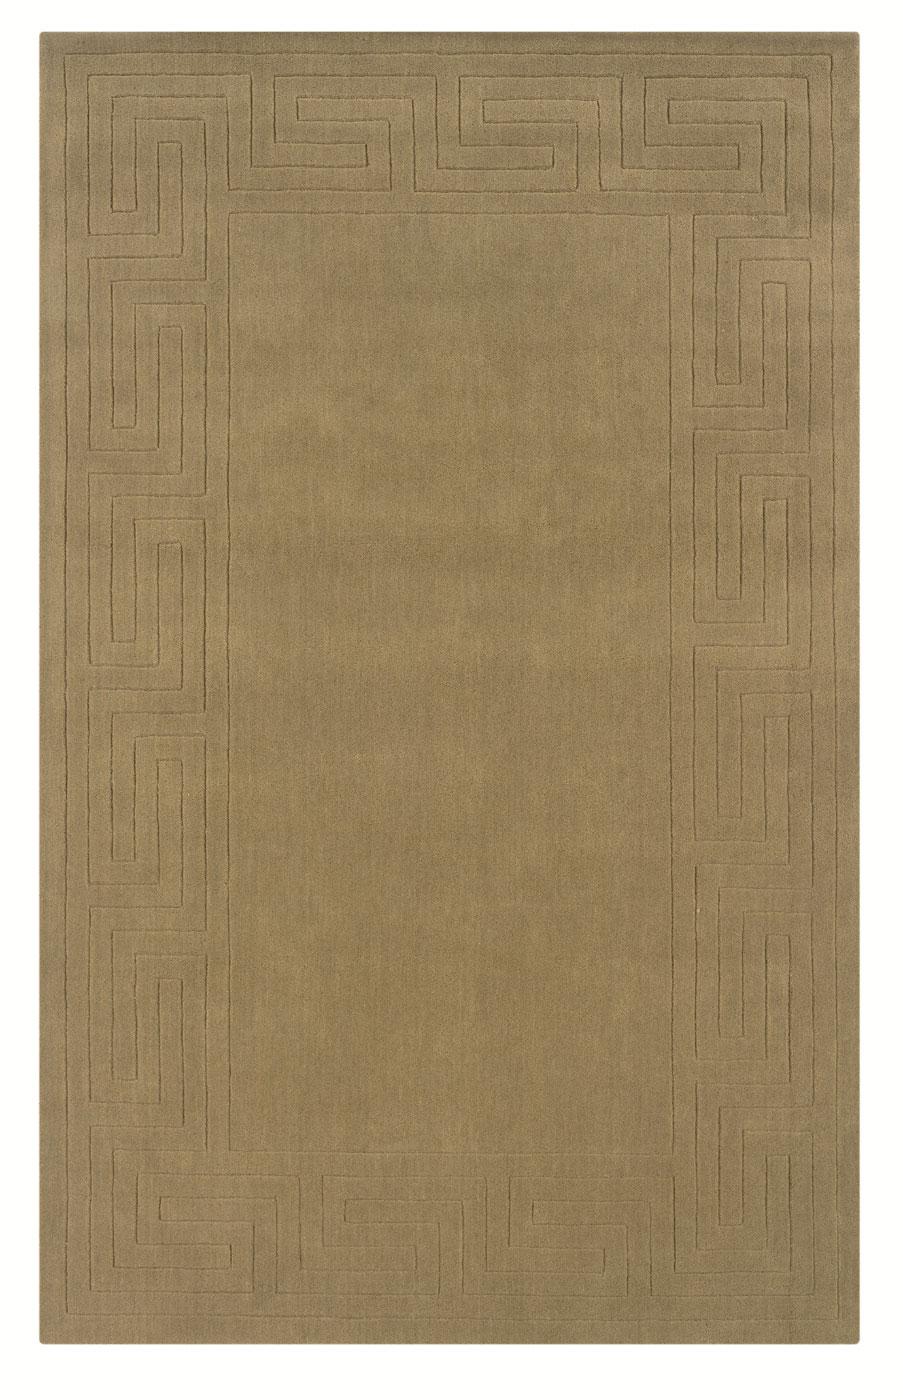 Classic Cedar Green With Greek Key Pattern Rug By Linon